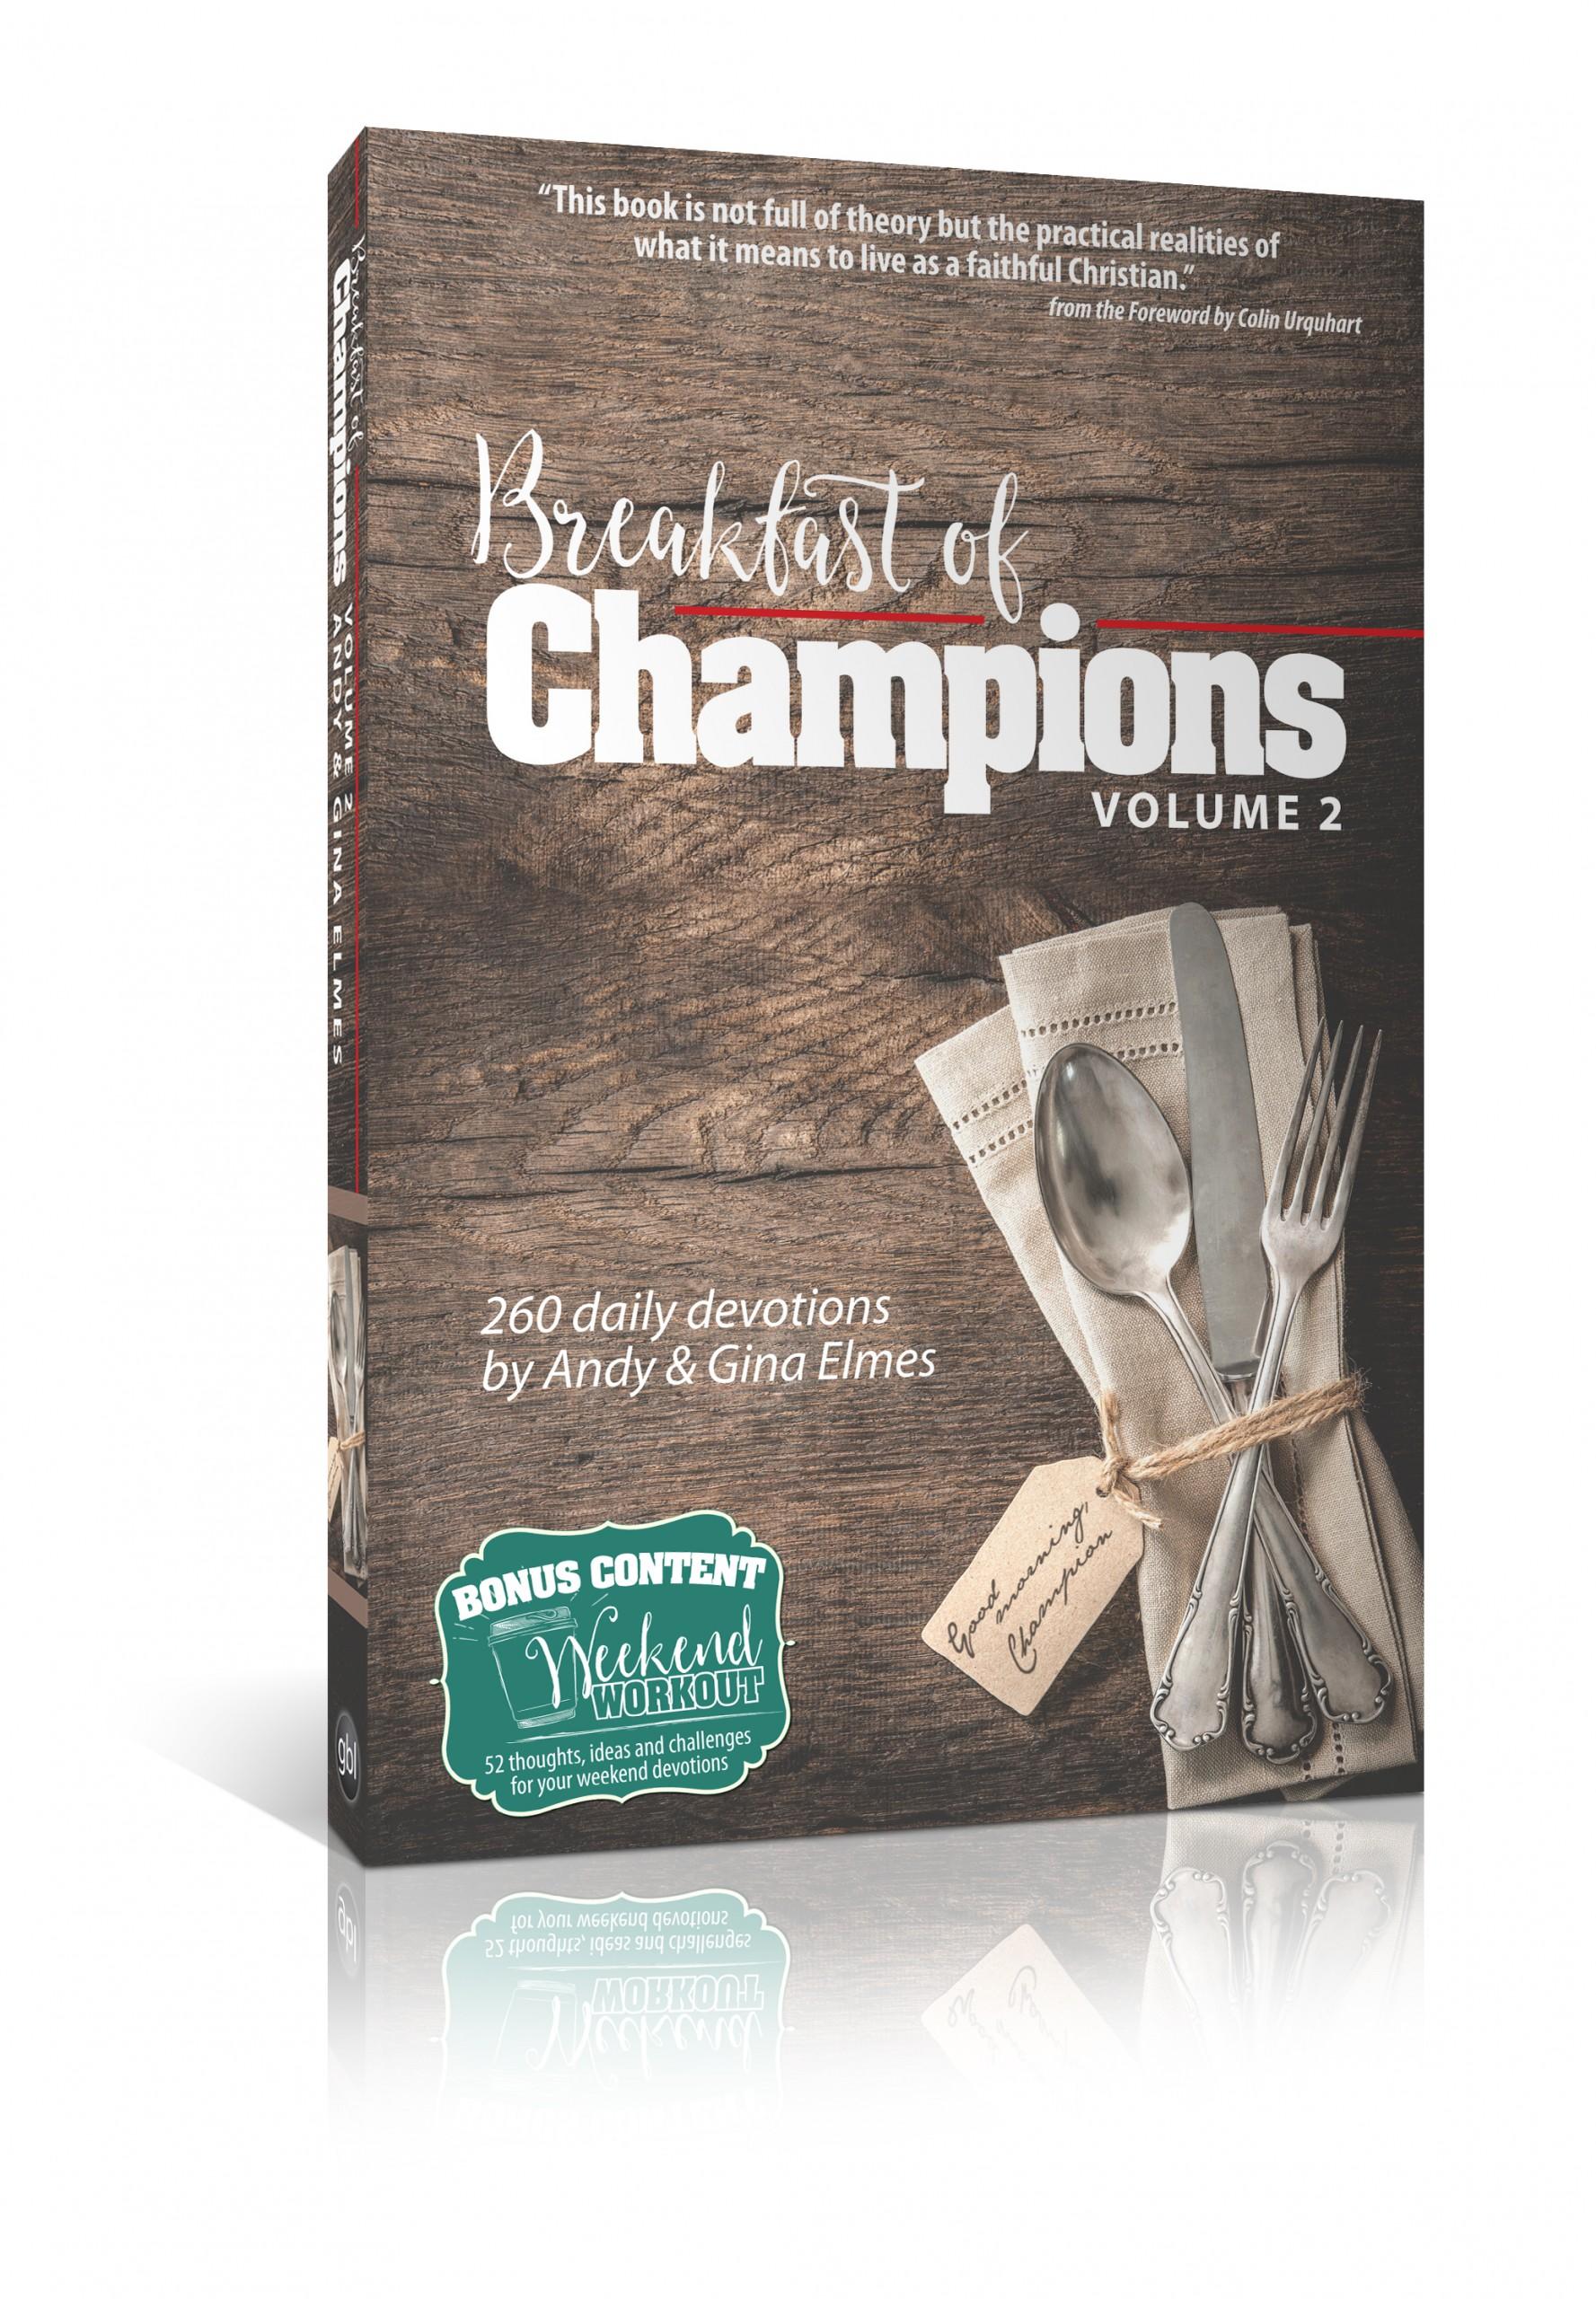 Breakfast of Champions Volume 2